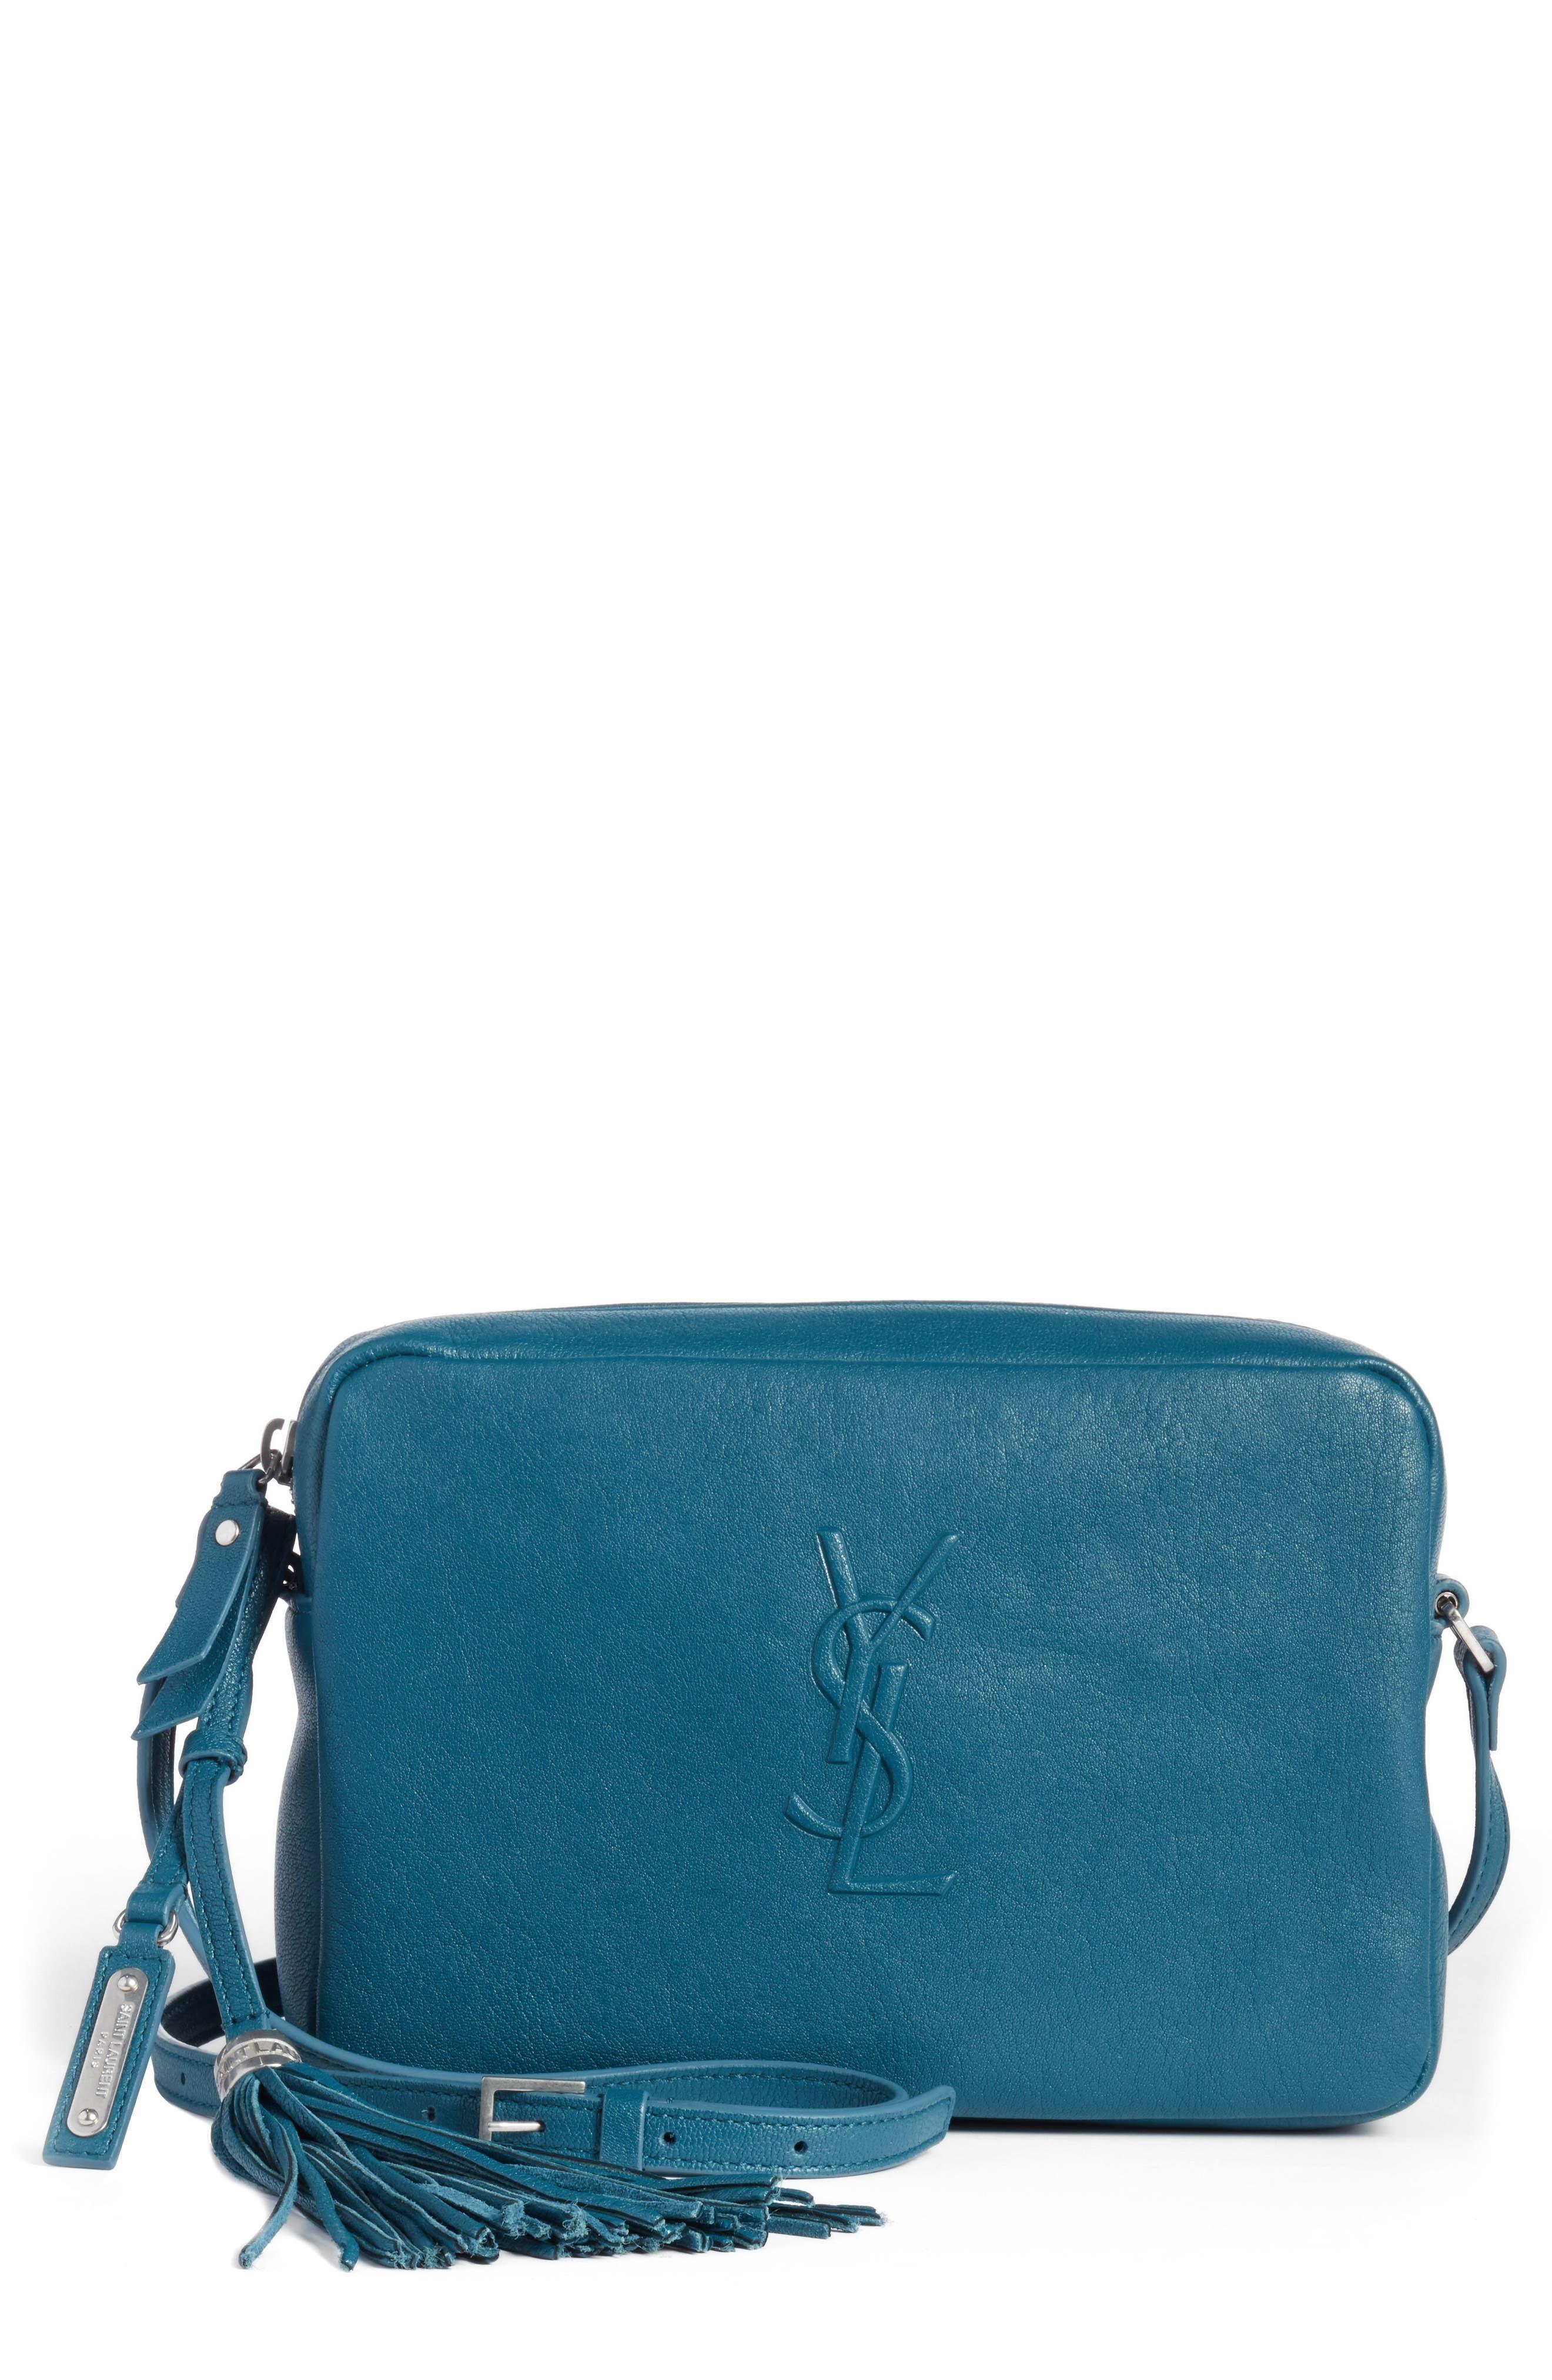 Alternate Image 1 Selected - Saint Laurent Small Mono Leather Camera Bag